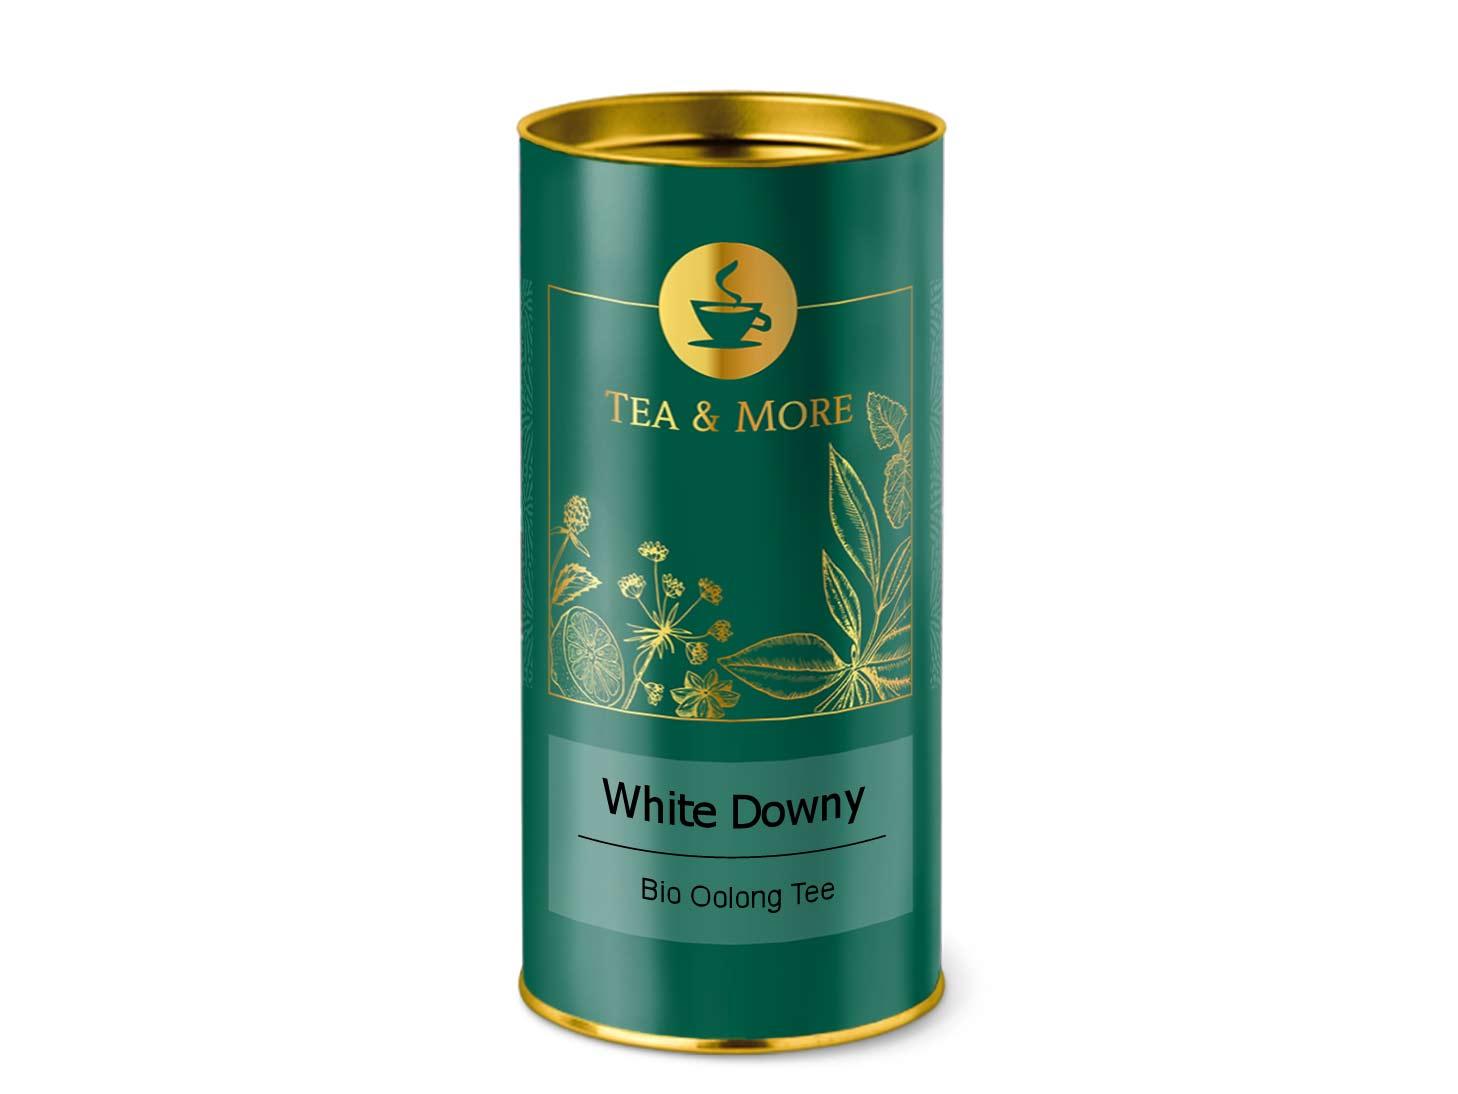 China White Downy Oolong (Bio)